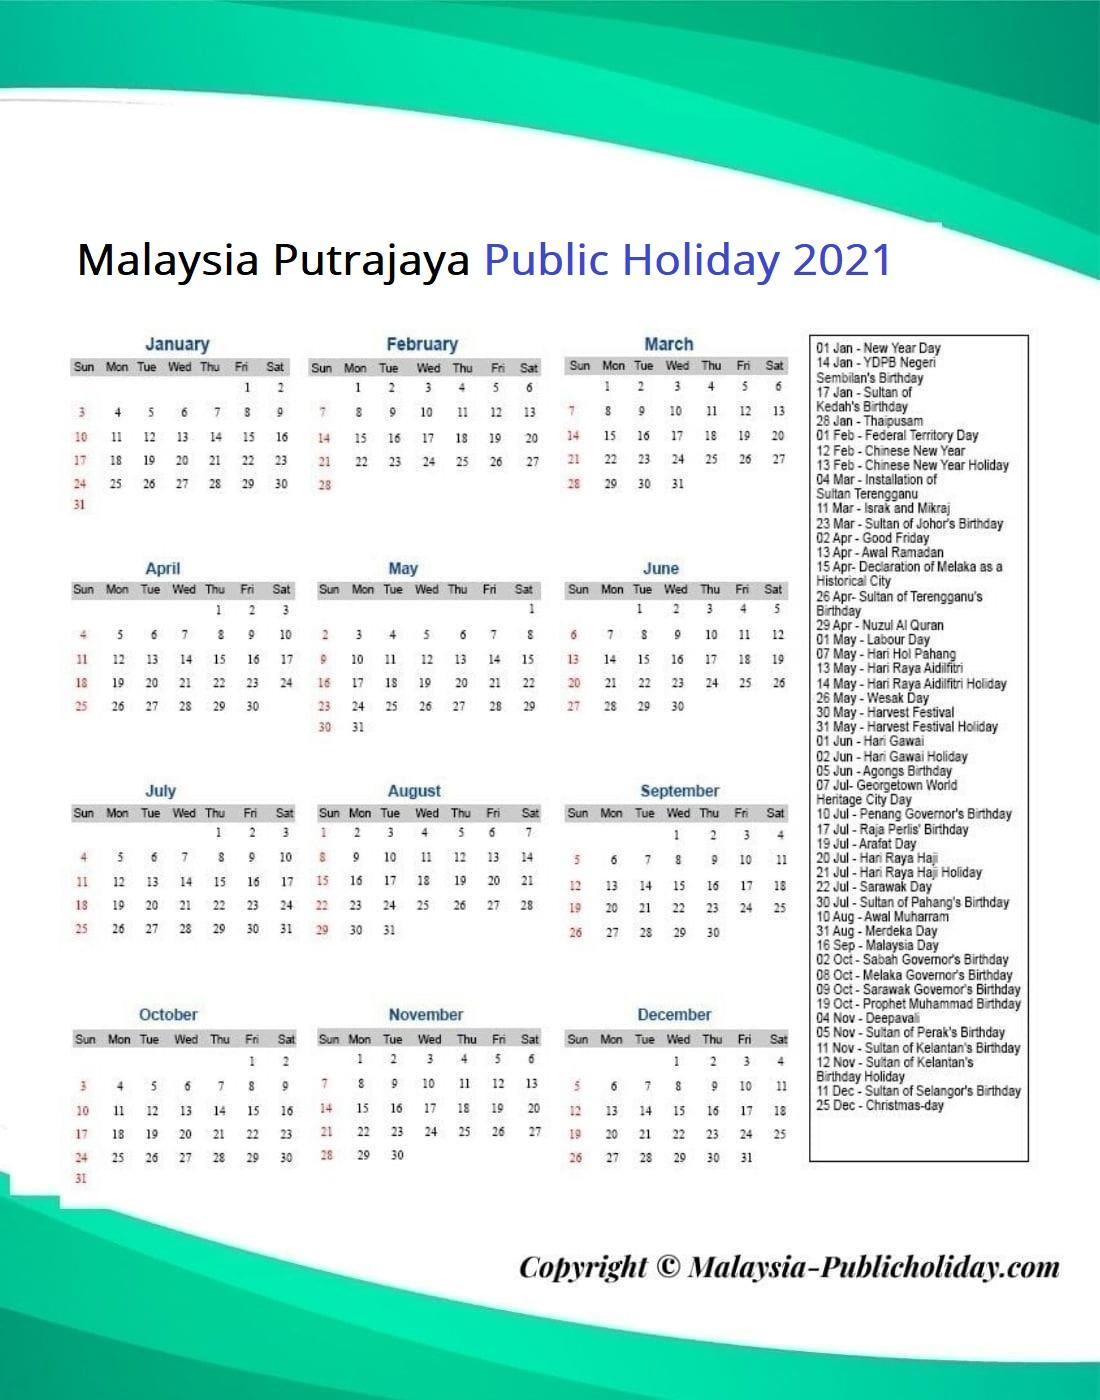 Putrajaya Public Holiday 2021